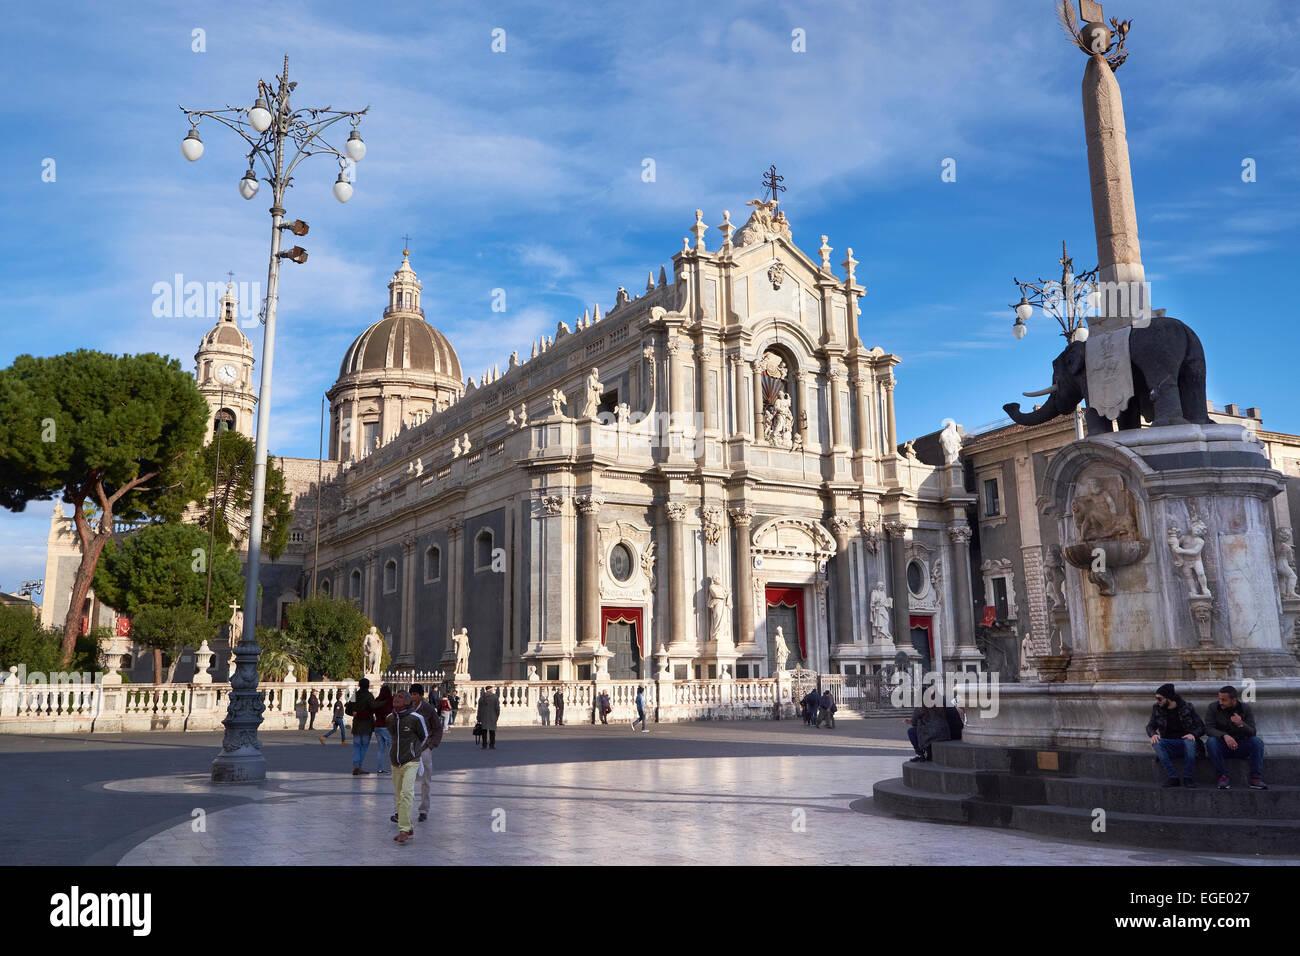 Kathedrale von St. Agatha, Catania, Sizilien. Duomo di Catania. Sakralarchitektur in Catania, Sizilien, Italien. Stockbild